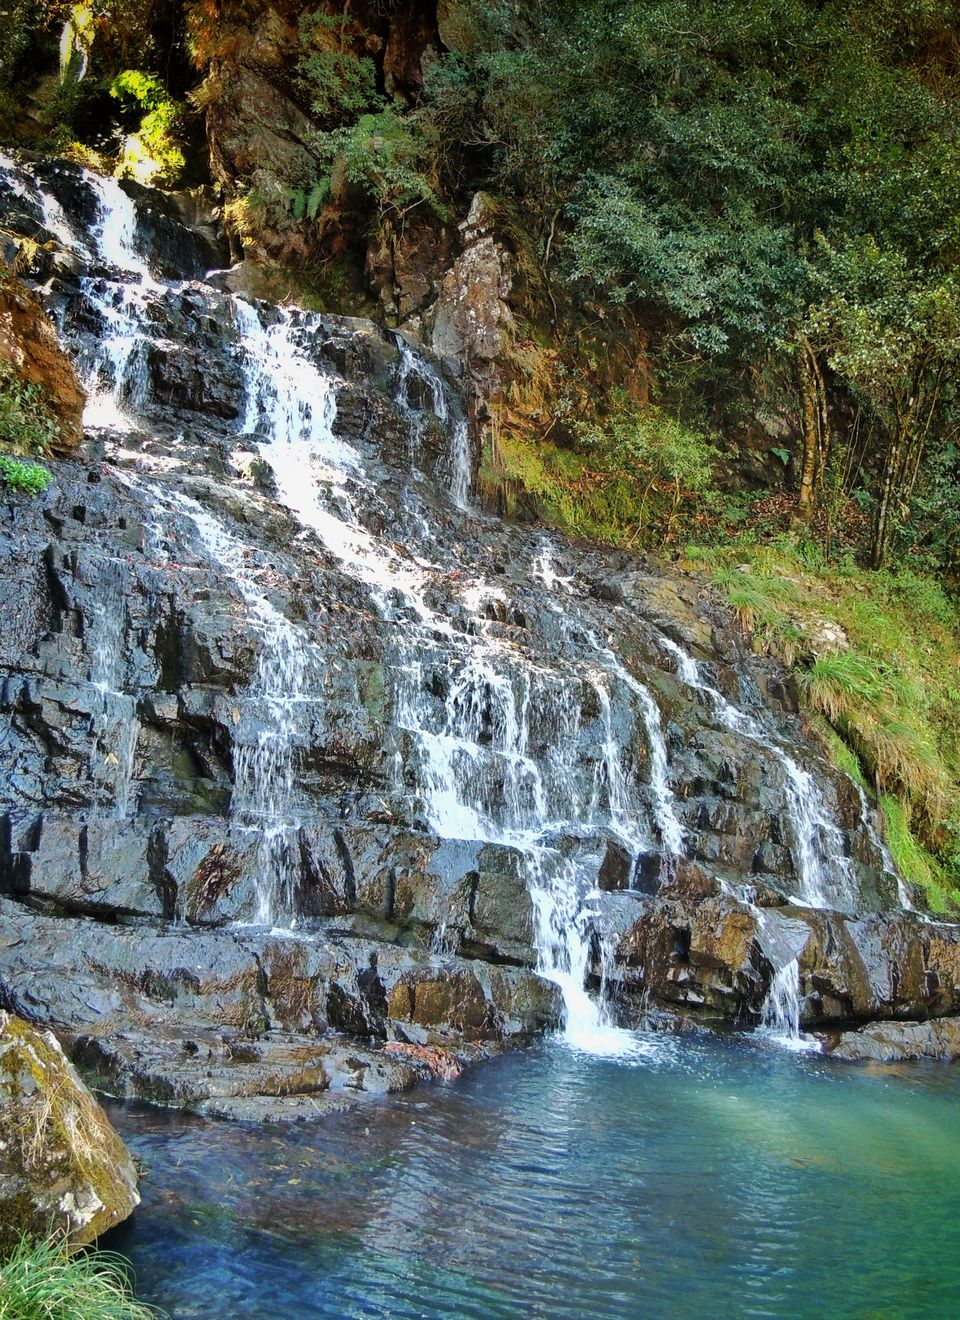 Photos of Elephant Falls, Shillong, Meghalaya, India 1/1 by pshrutika